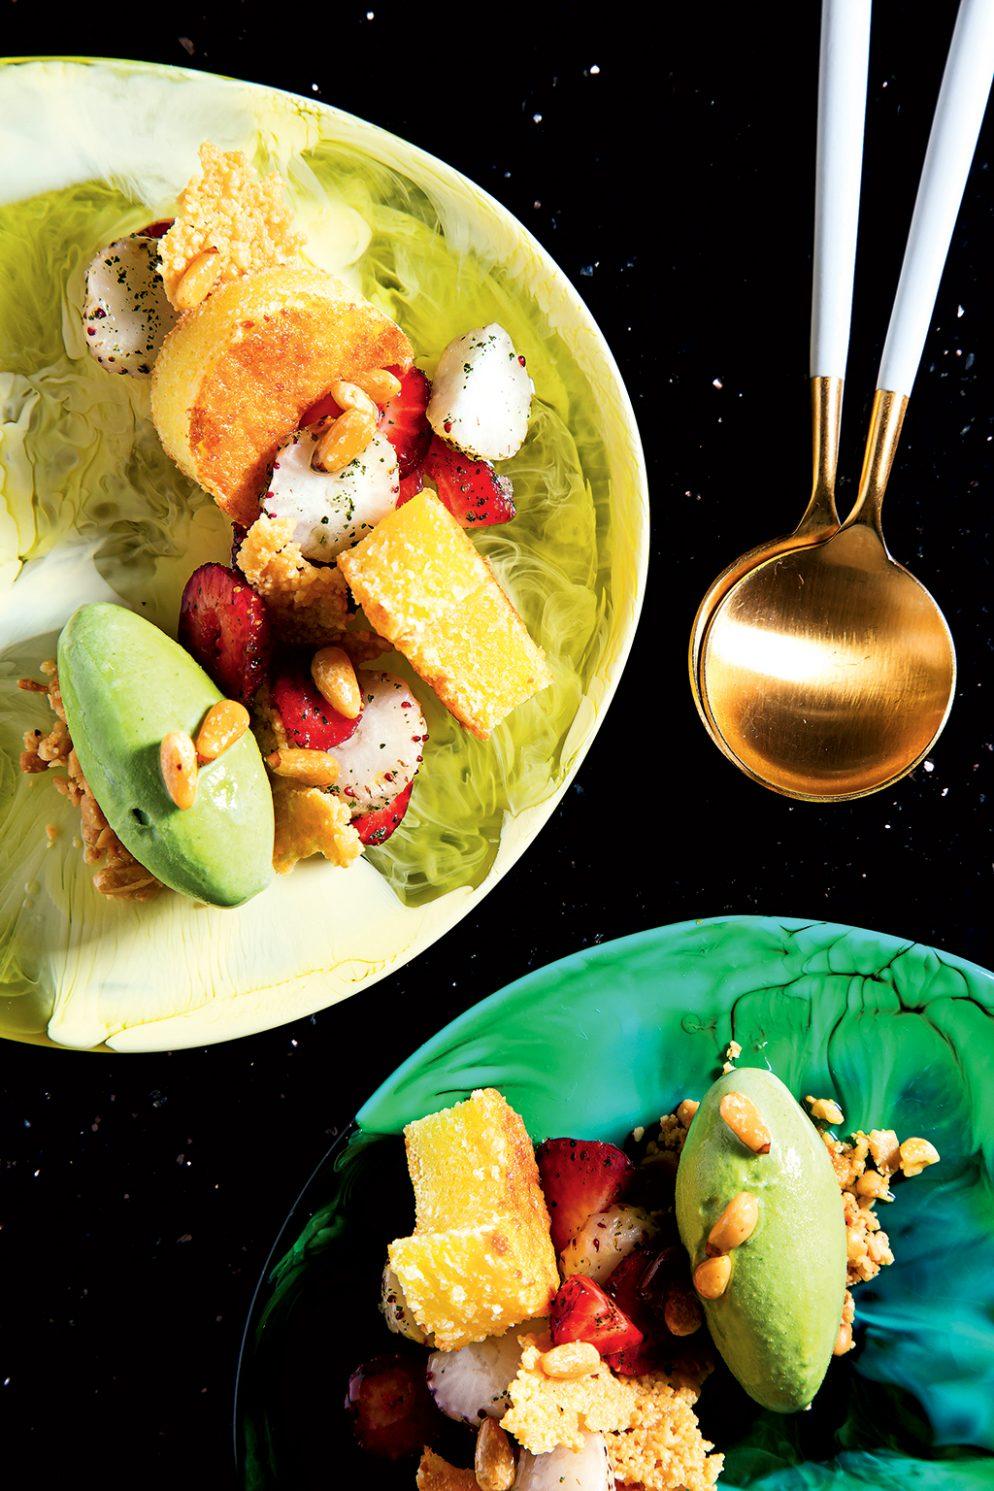 A dessert of pecorino cake with basil gelato and strawberries.